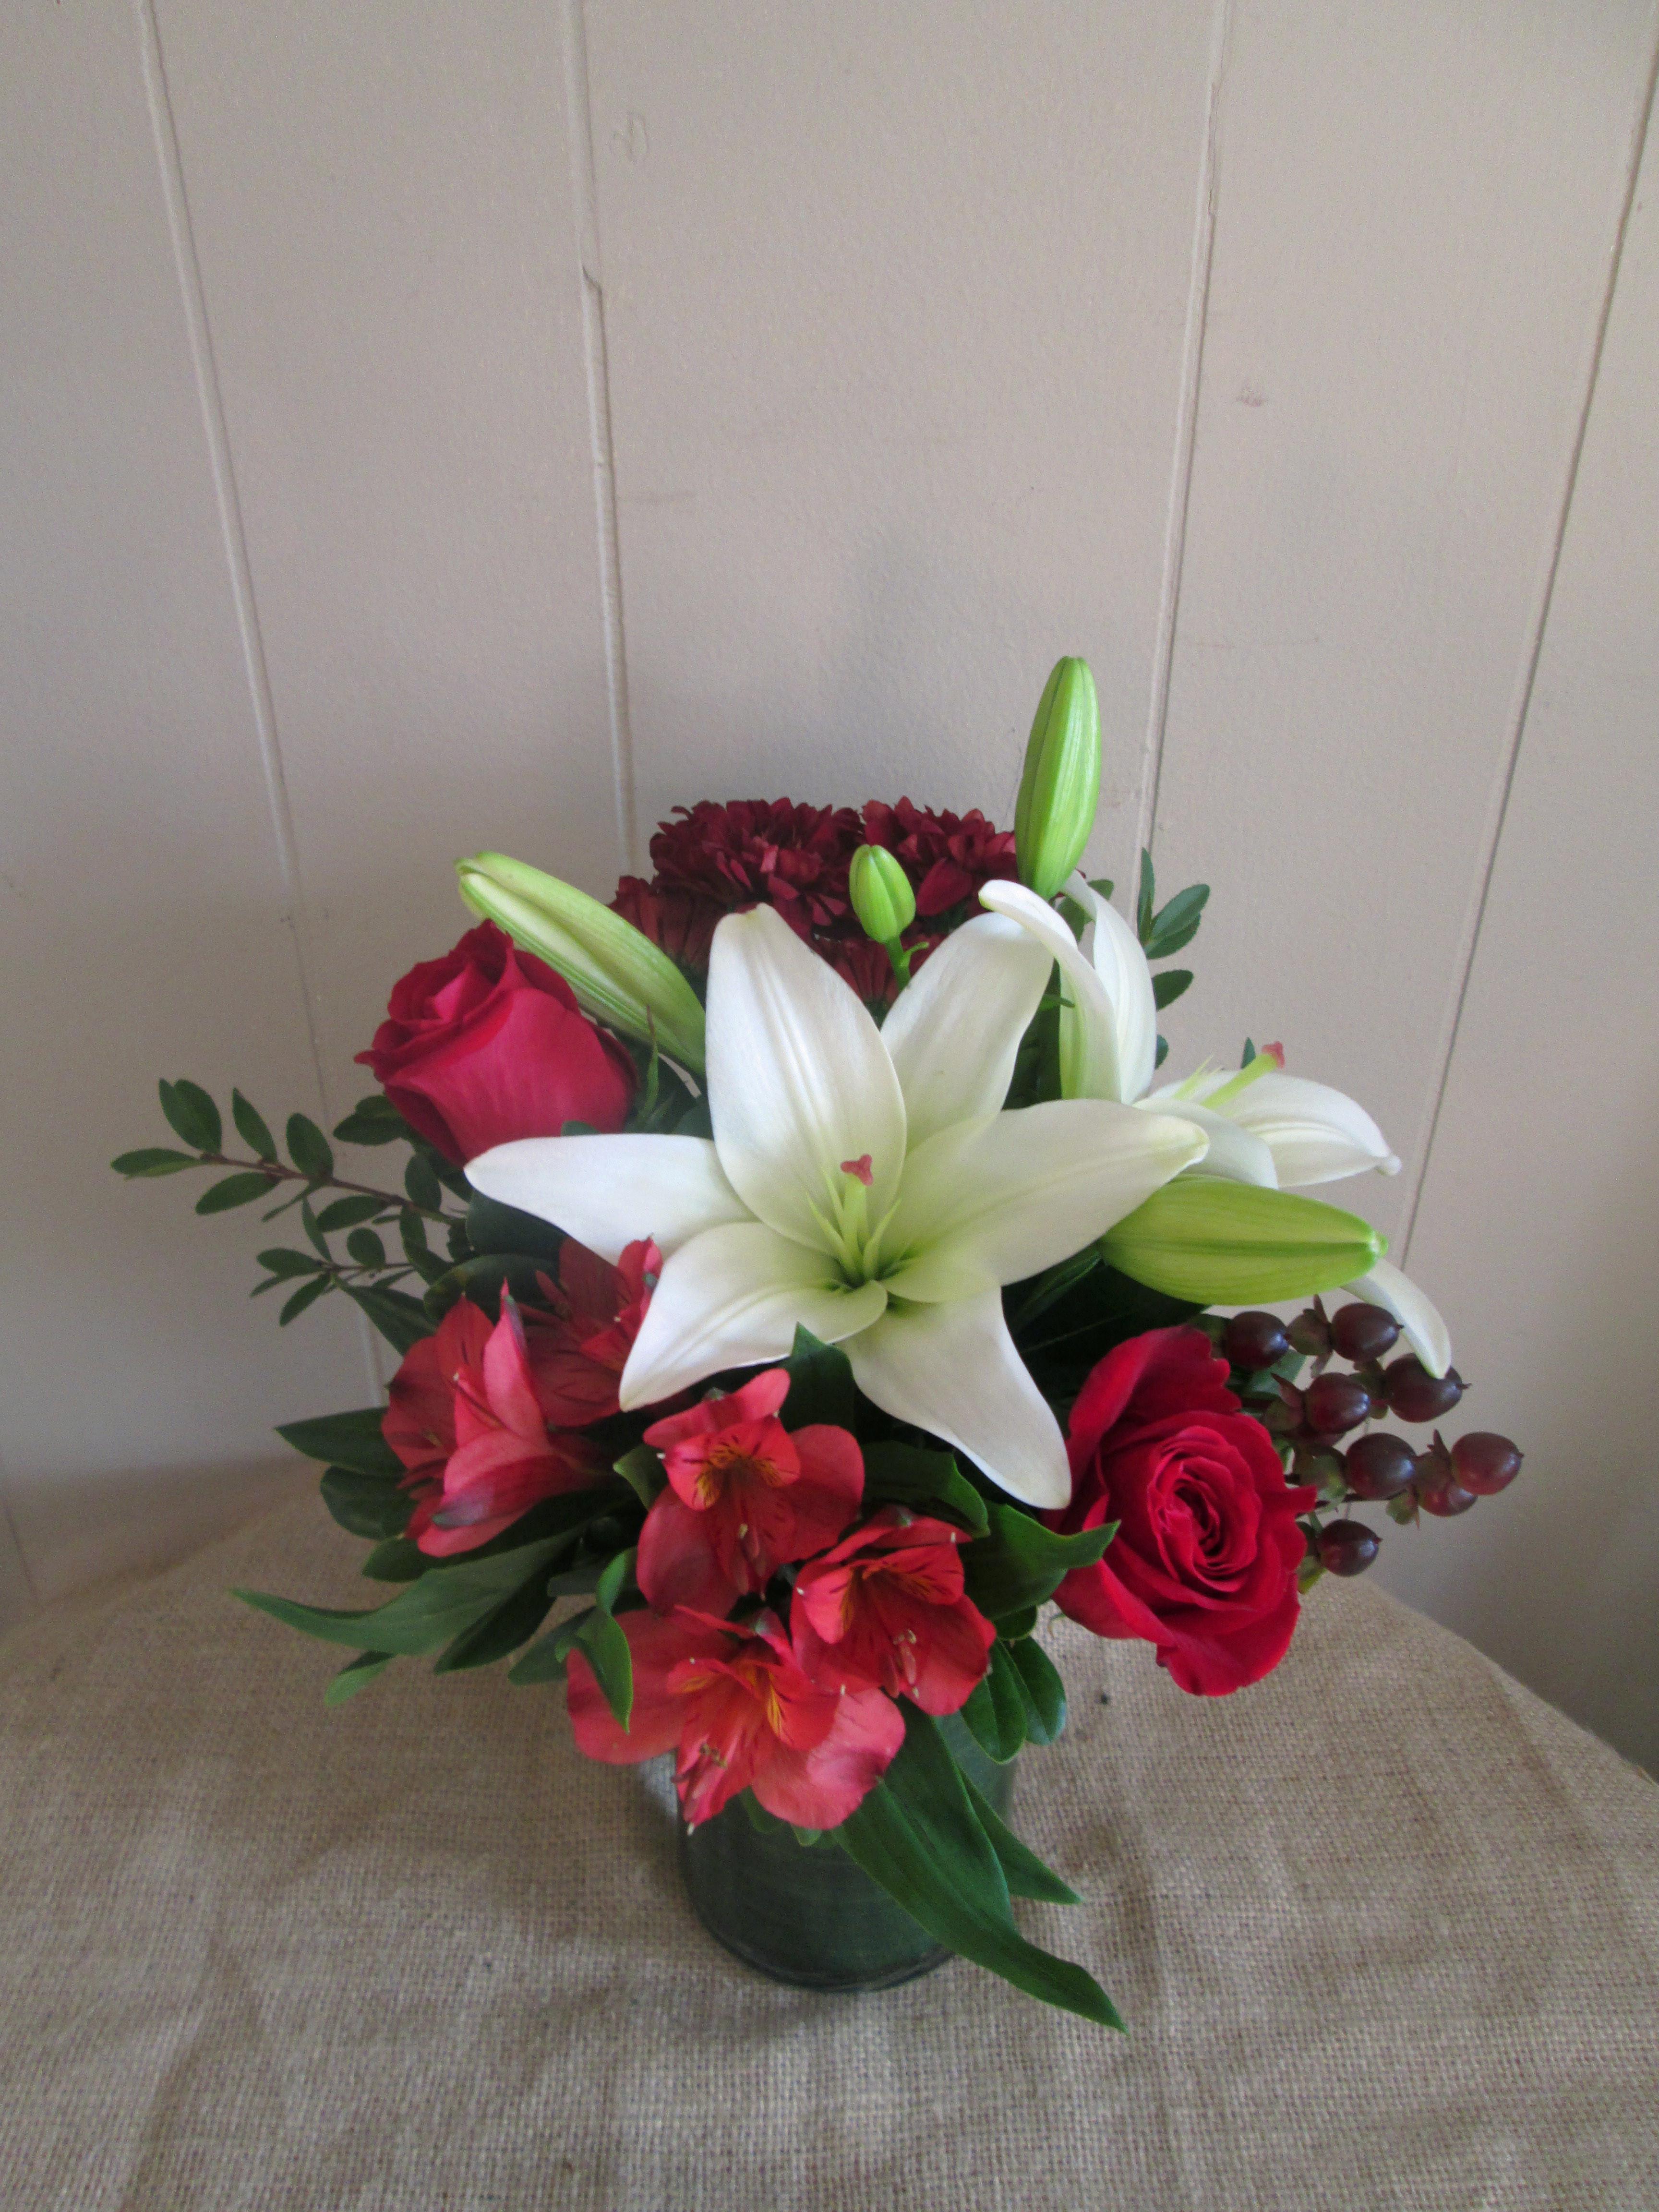 Willow park florist calgary se sincere lily izmirmasajfo